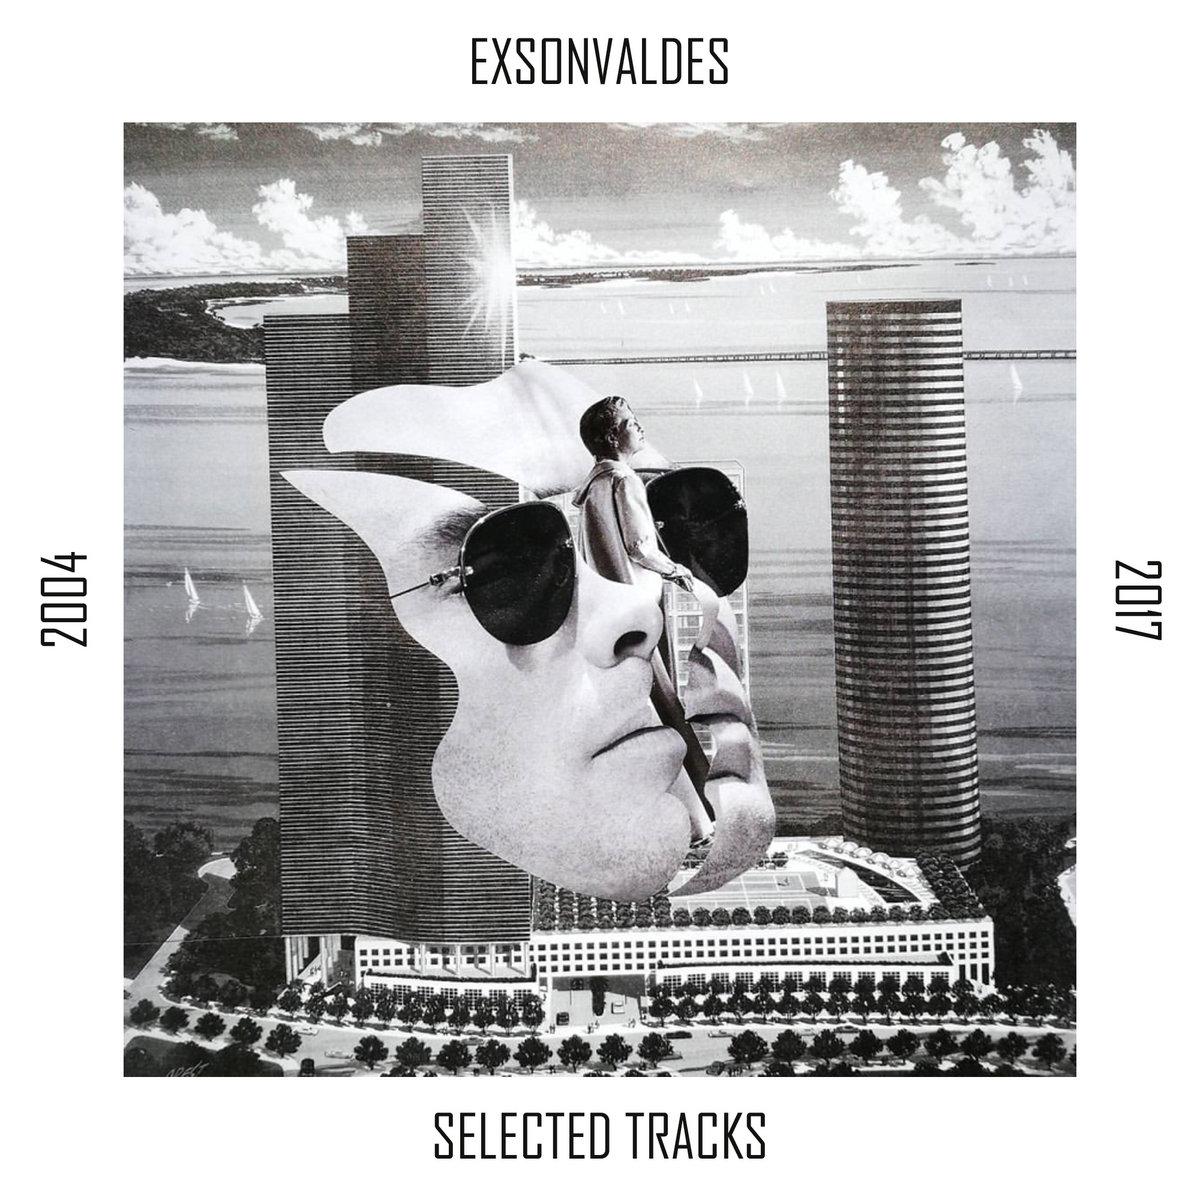 Exsonvaldes selected